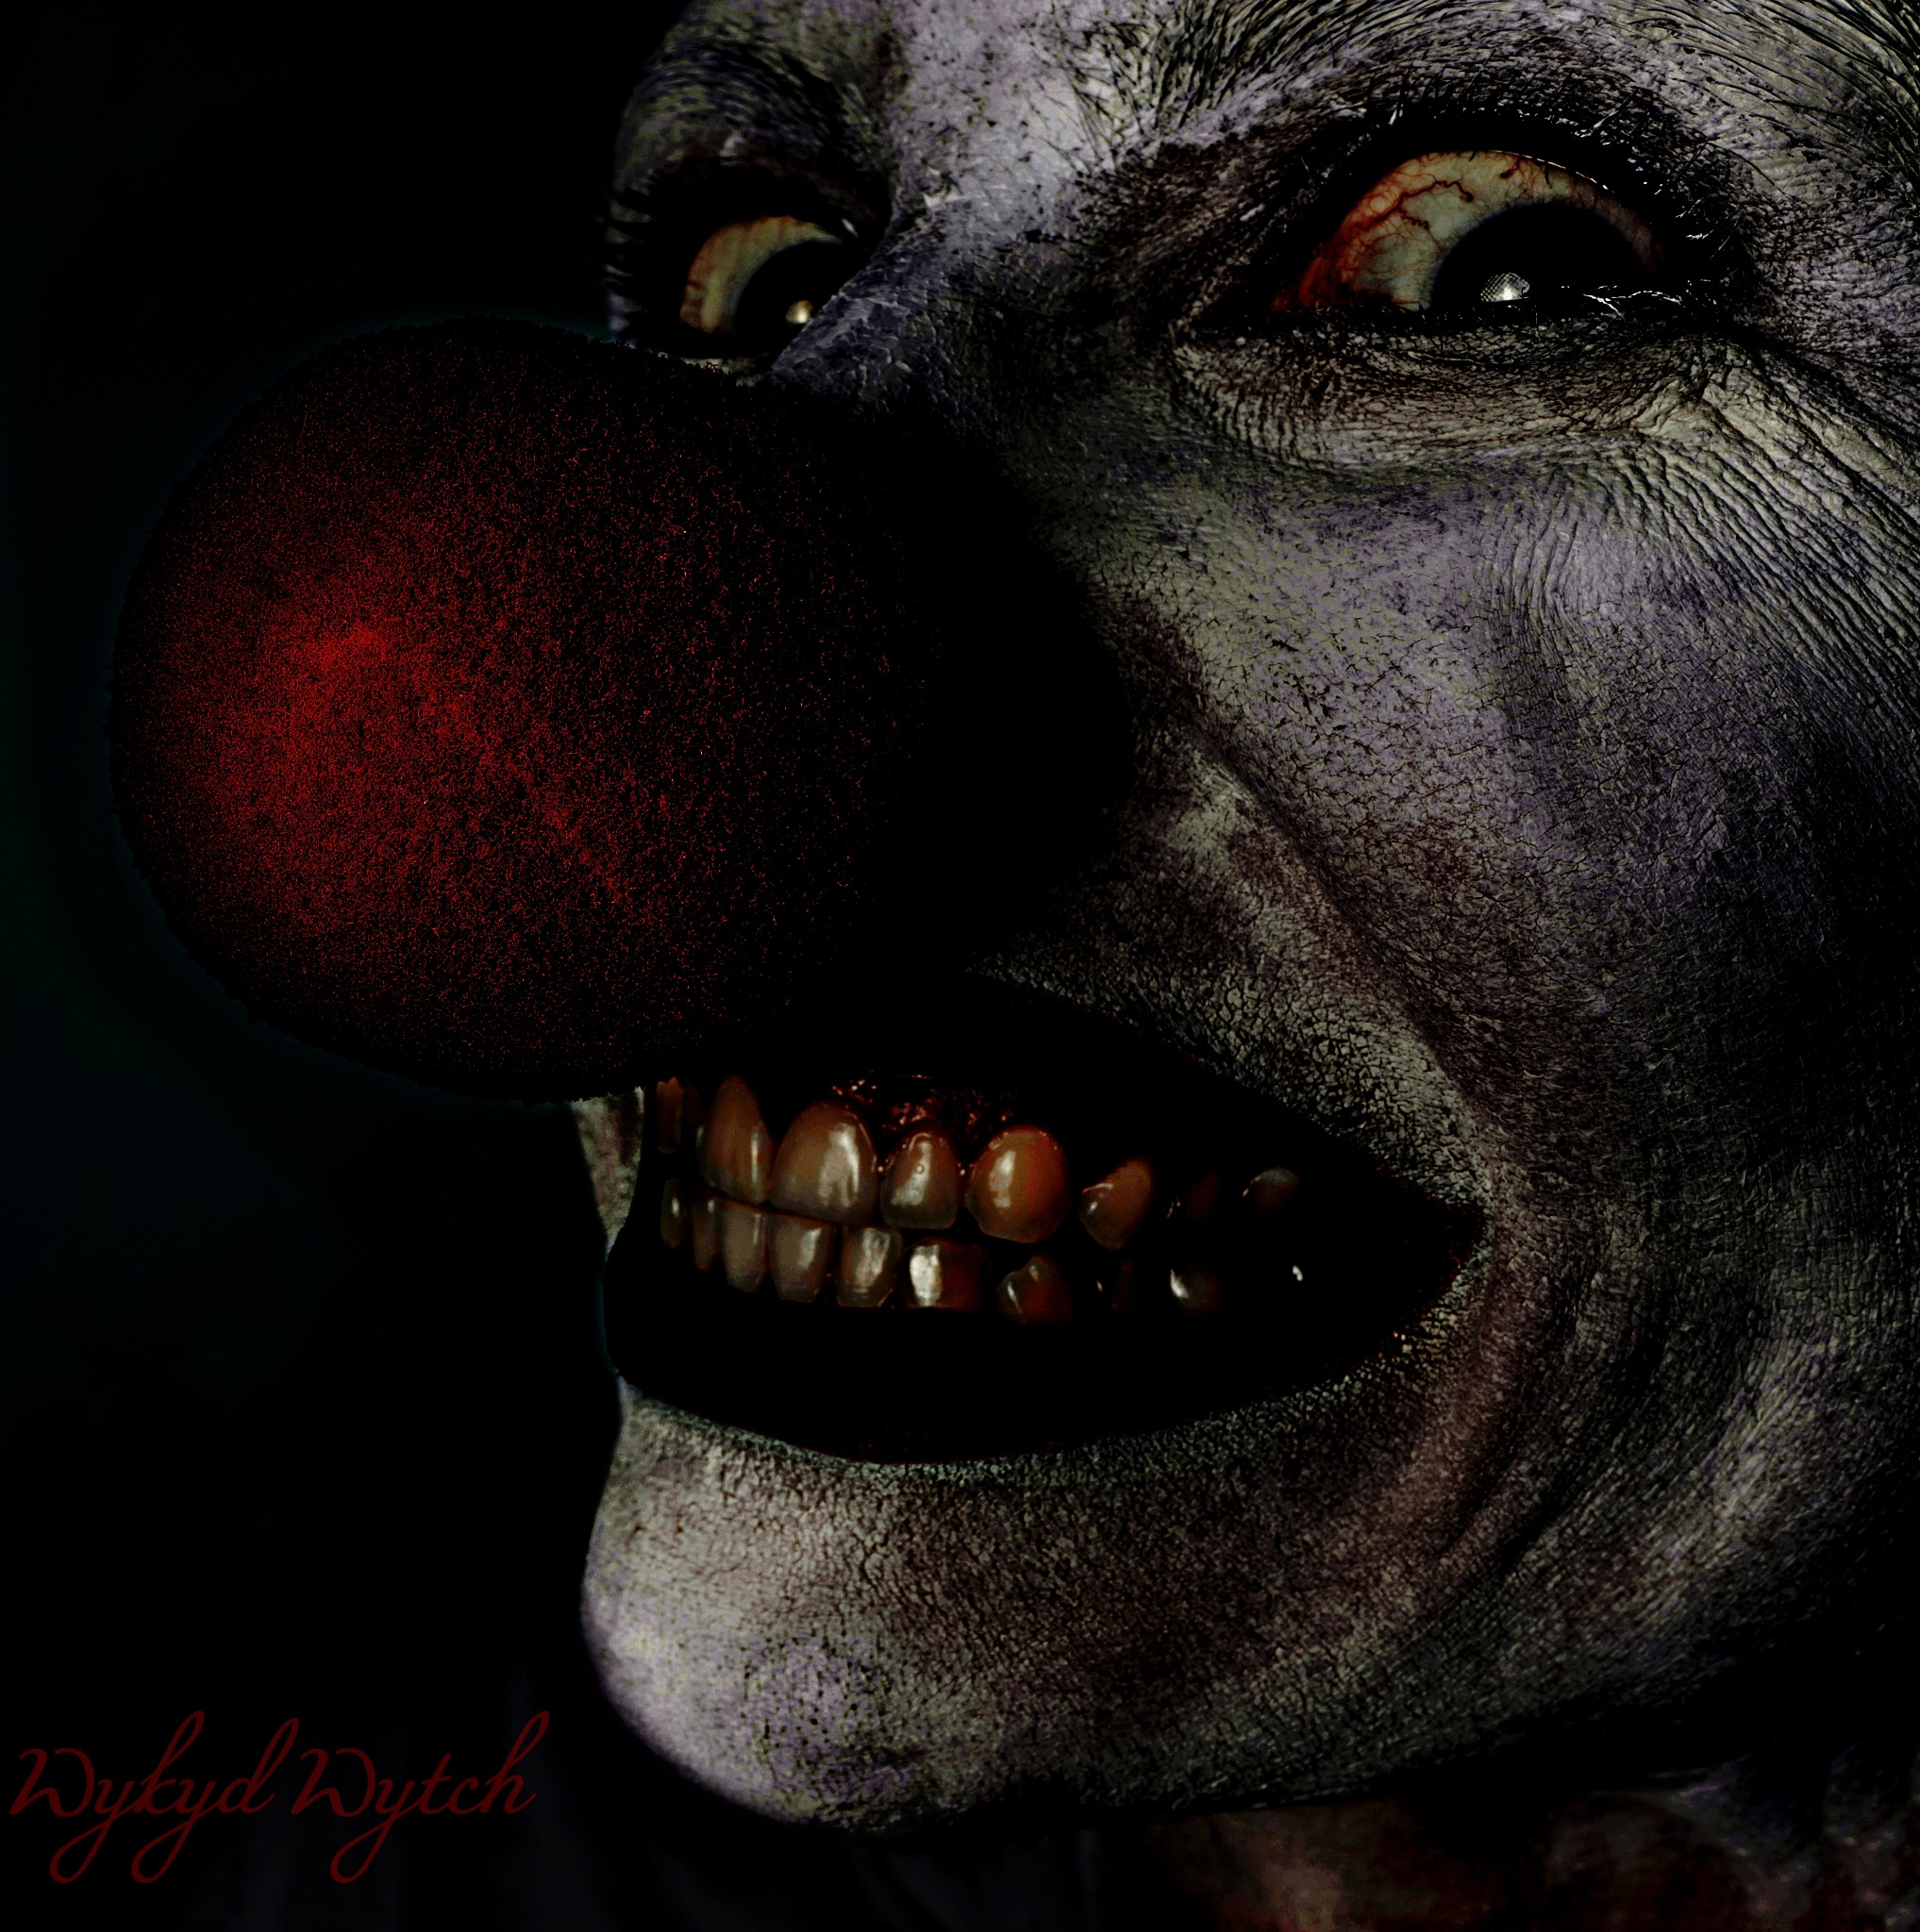 Killer Klown by Emerald City Digital